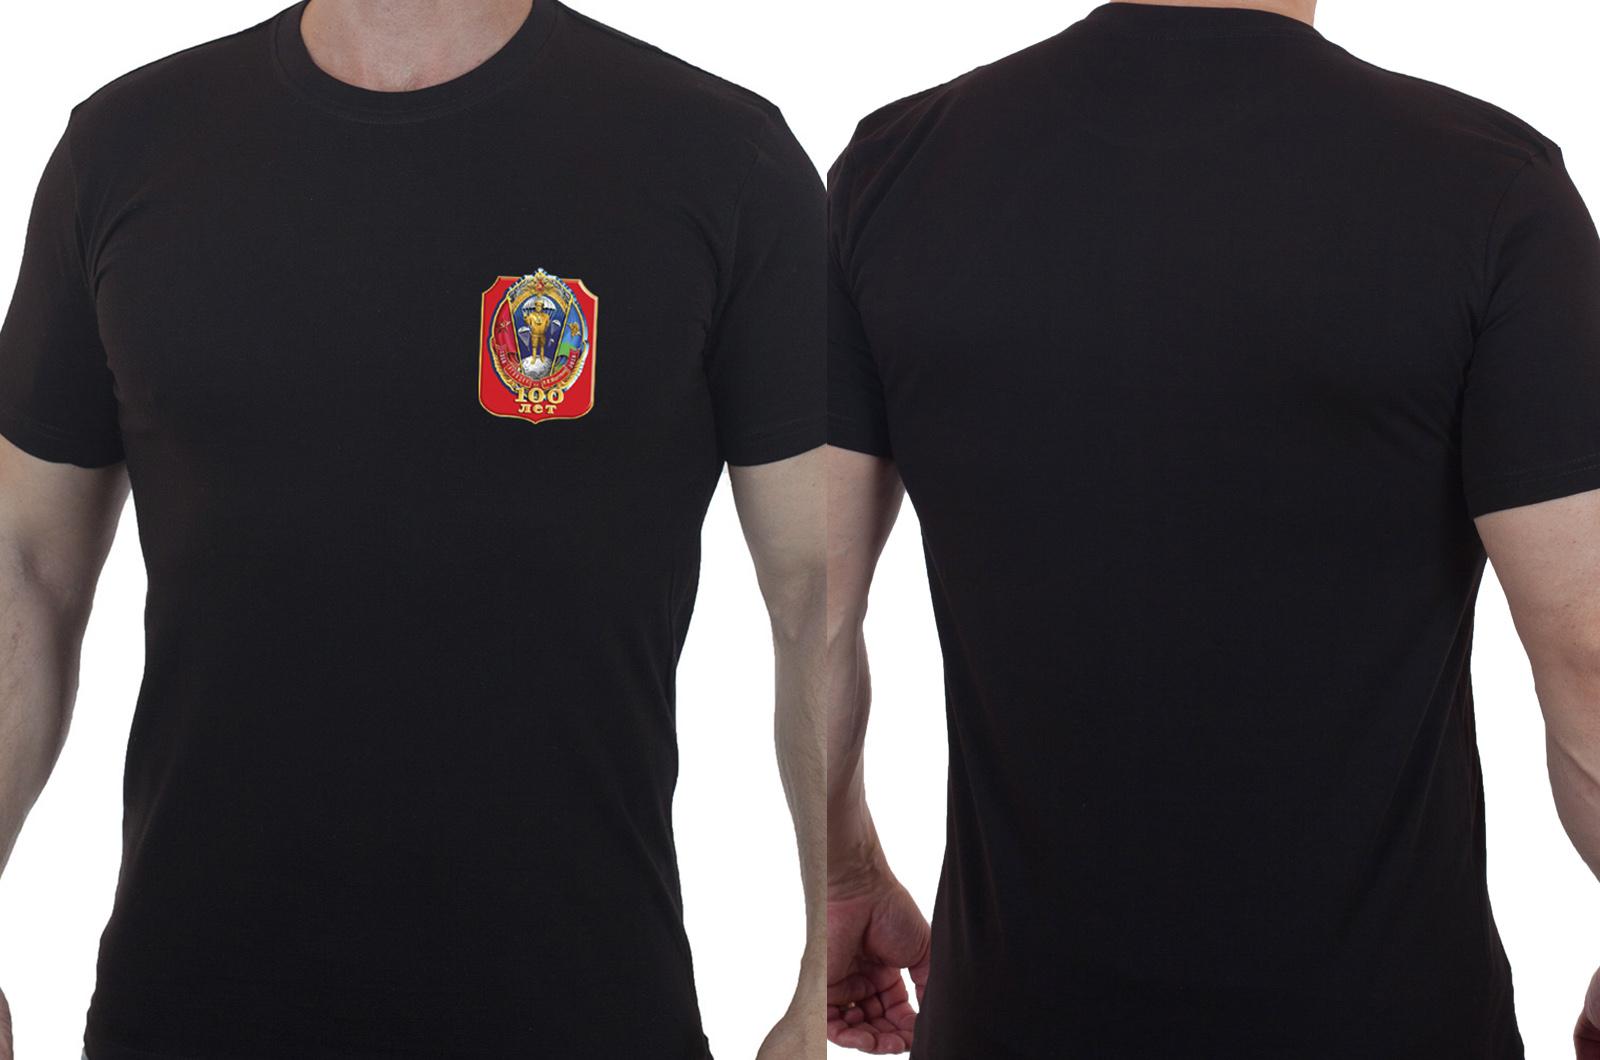 Подарочная футболка ВДВ на юбилей